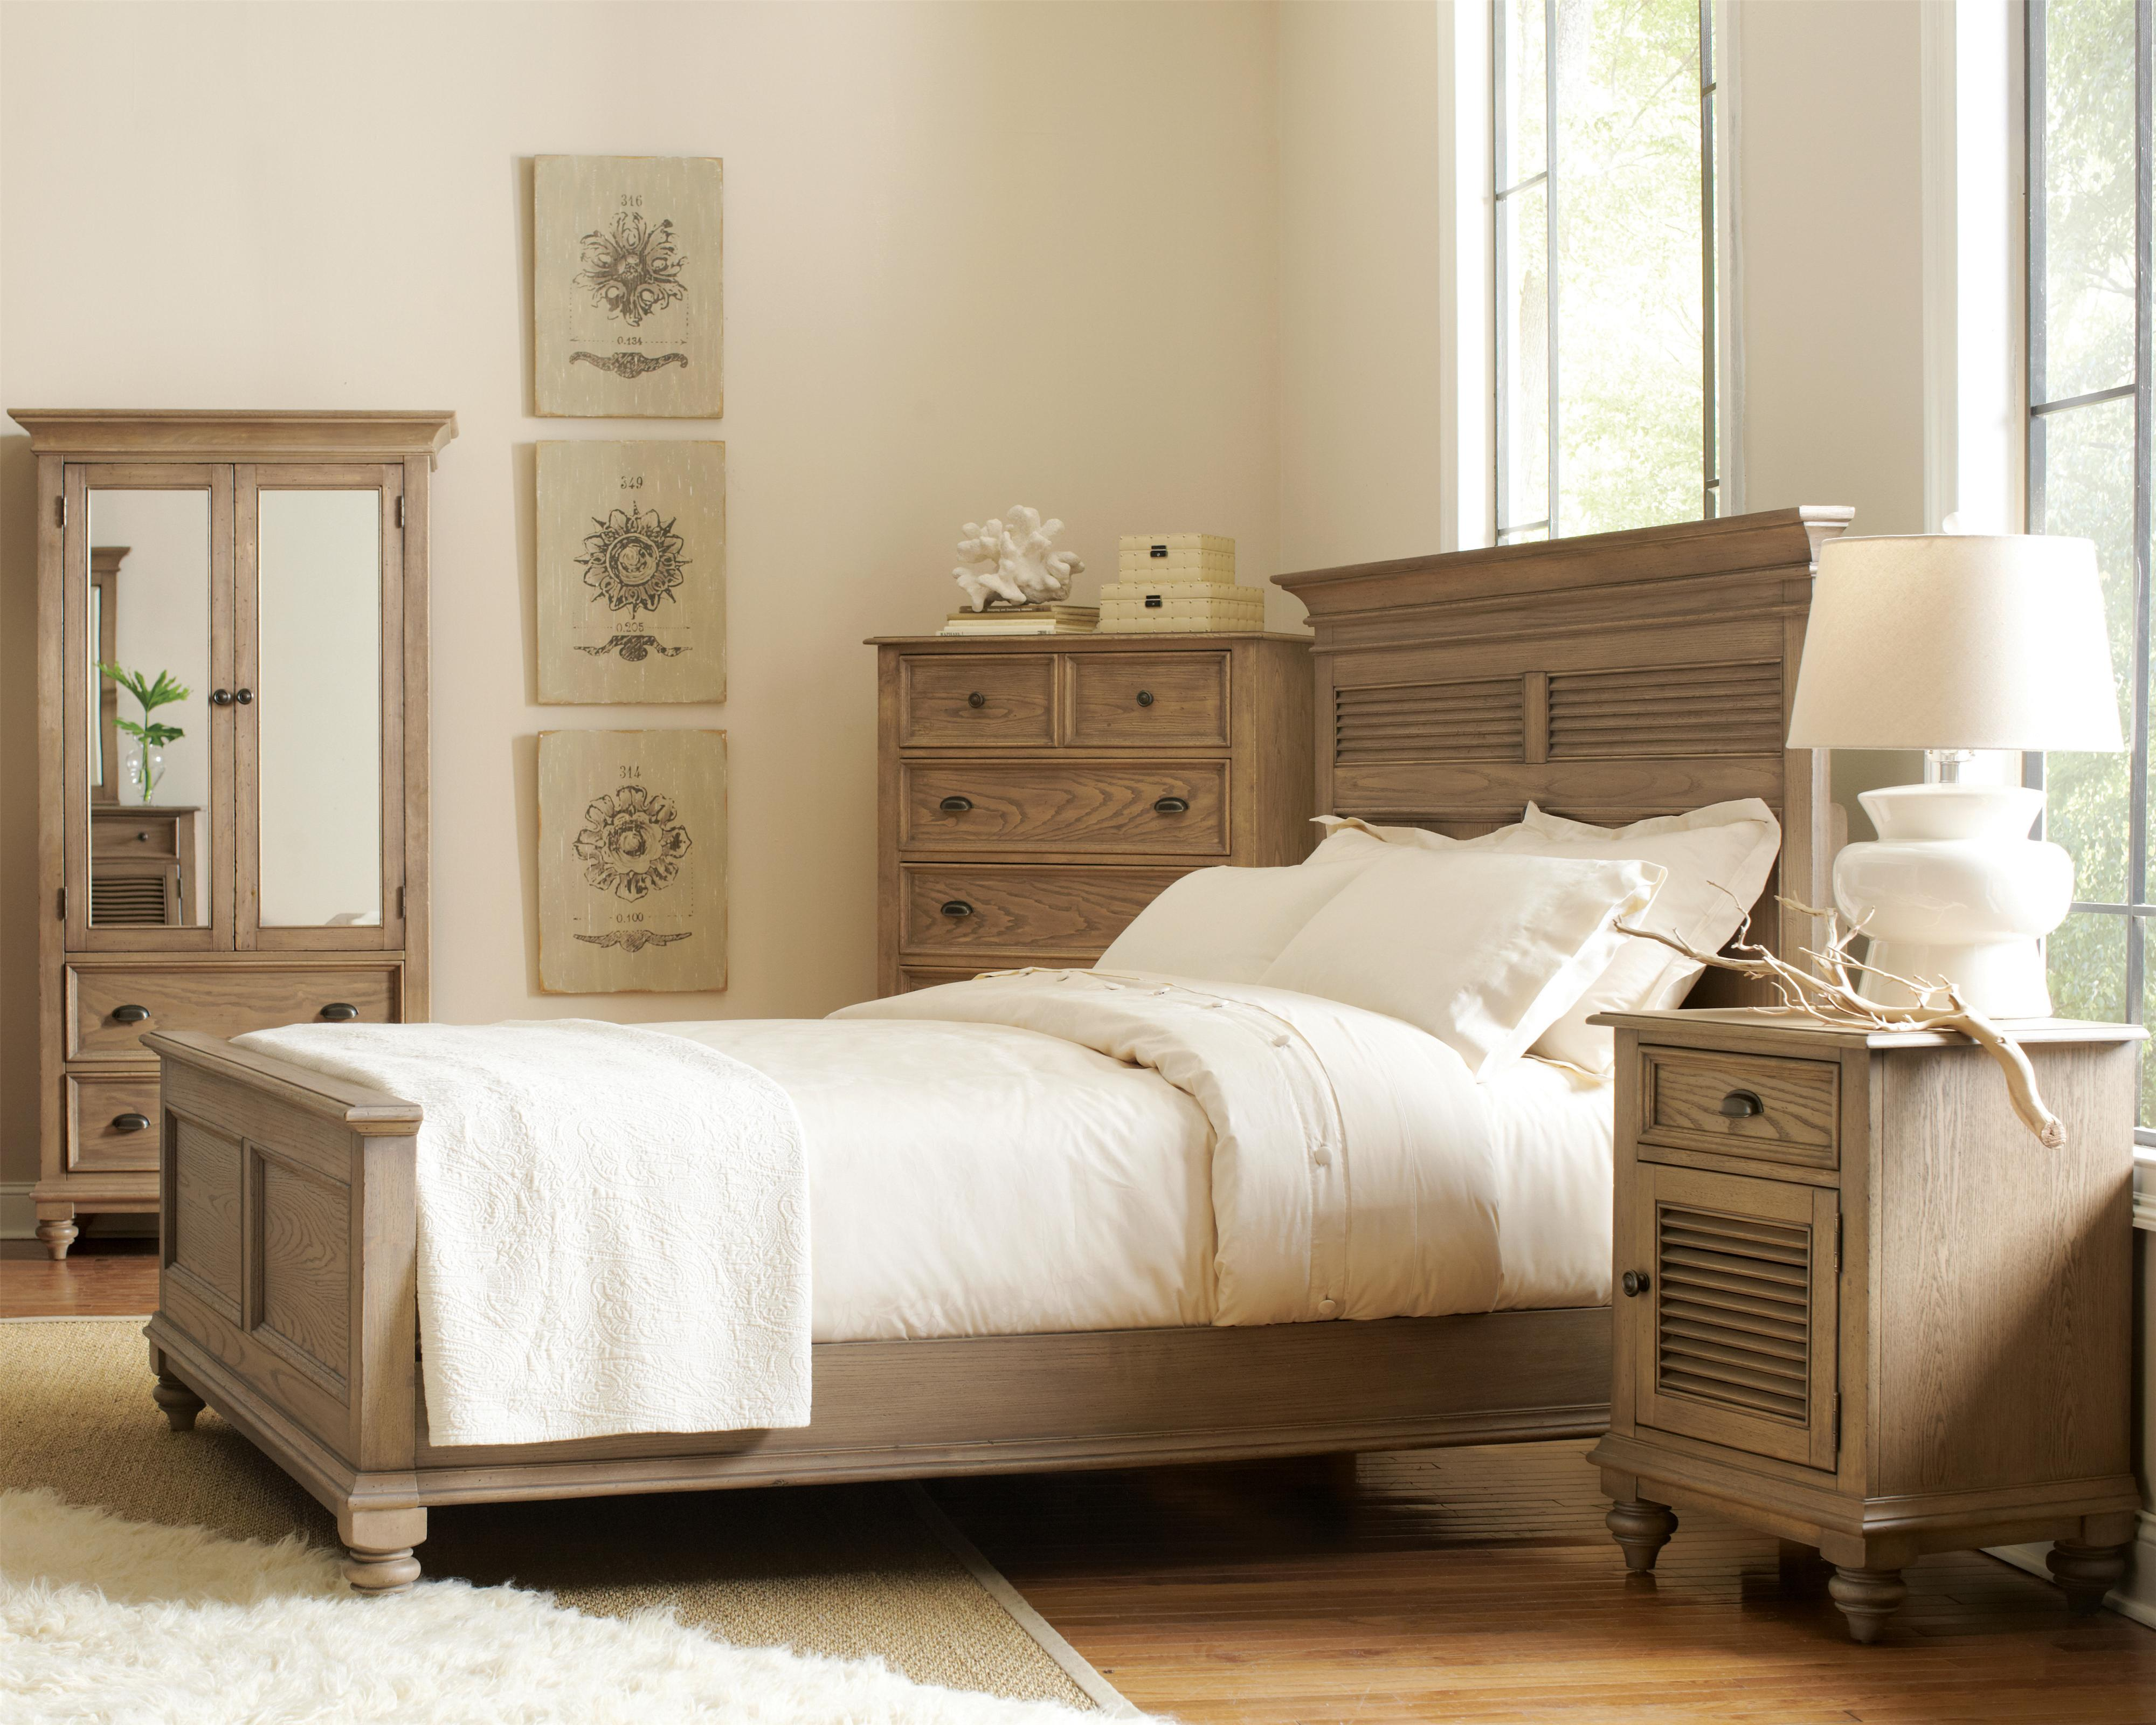 Riverside Furniture Coventry California King Bedroom Group - Item Number: 32400 C K Bedroom Group 7